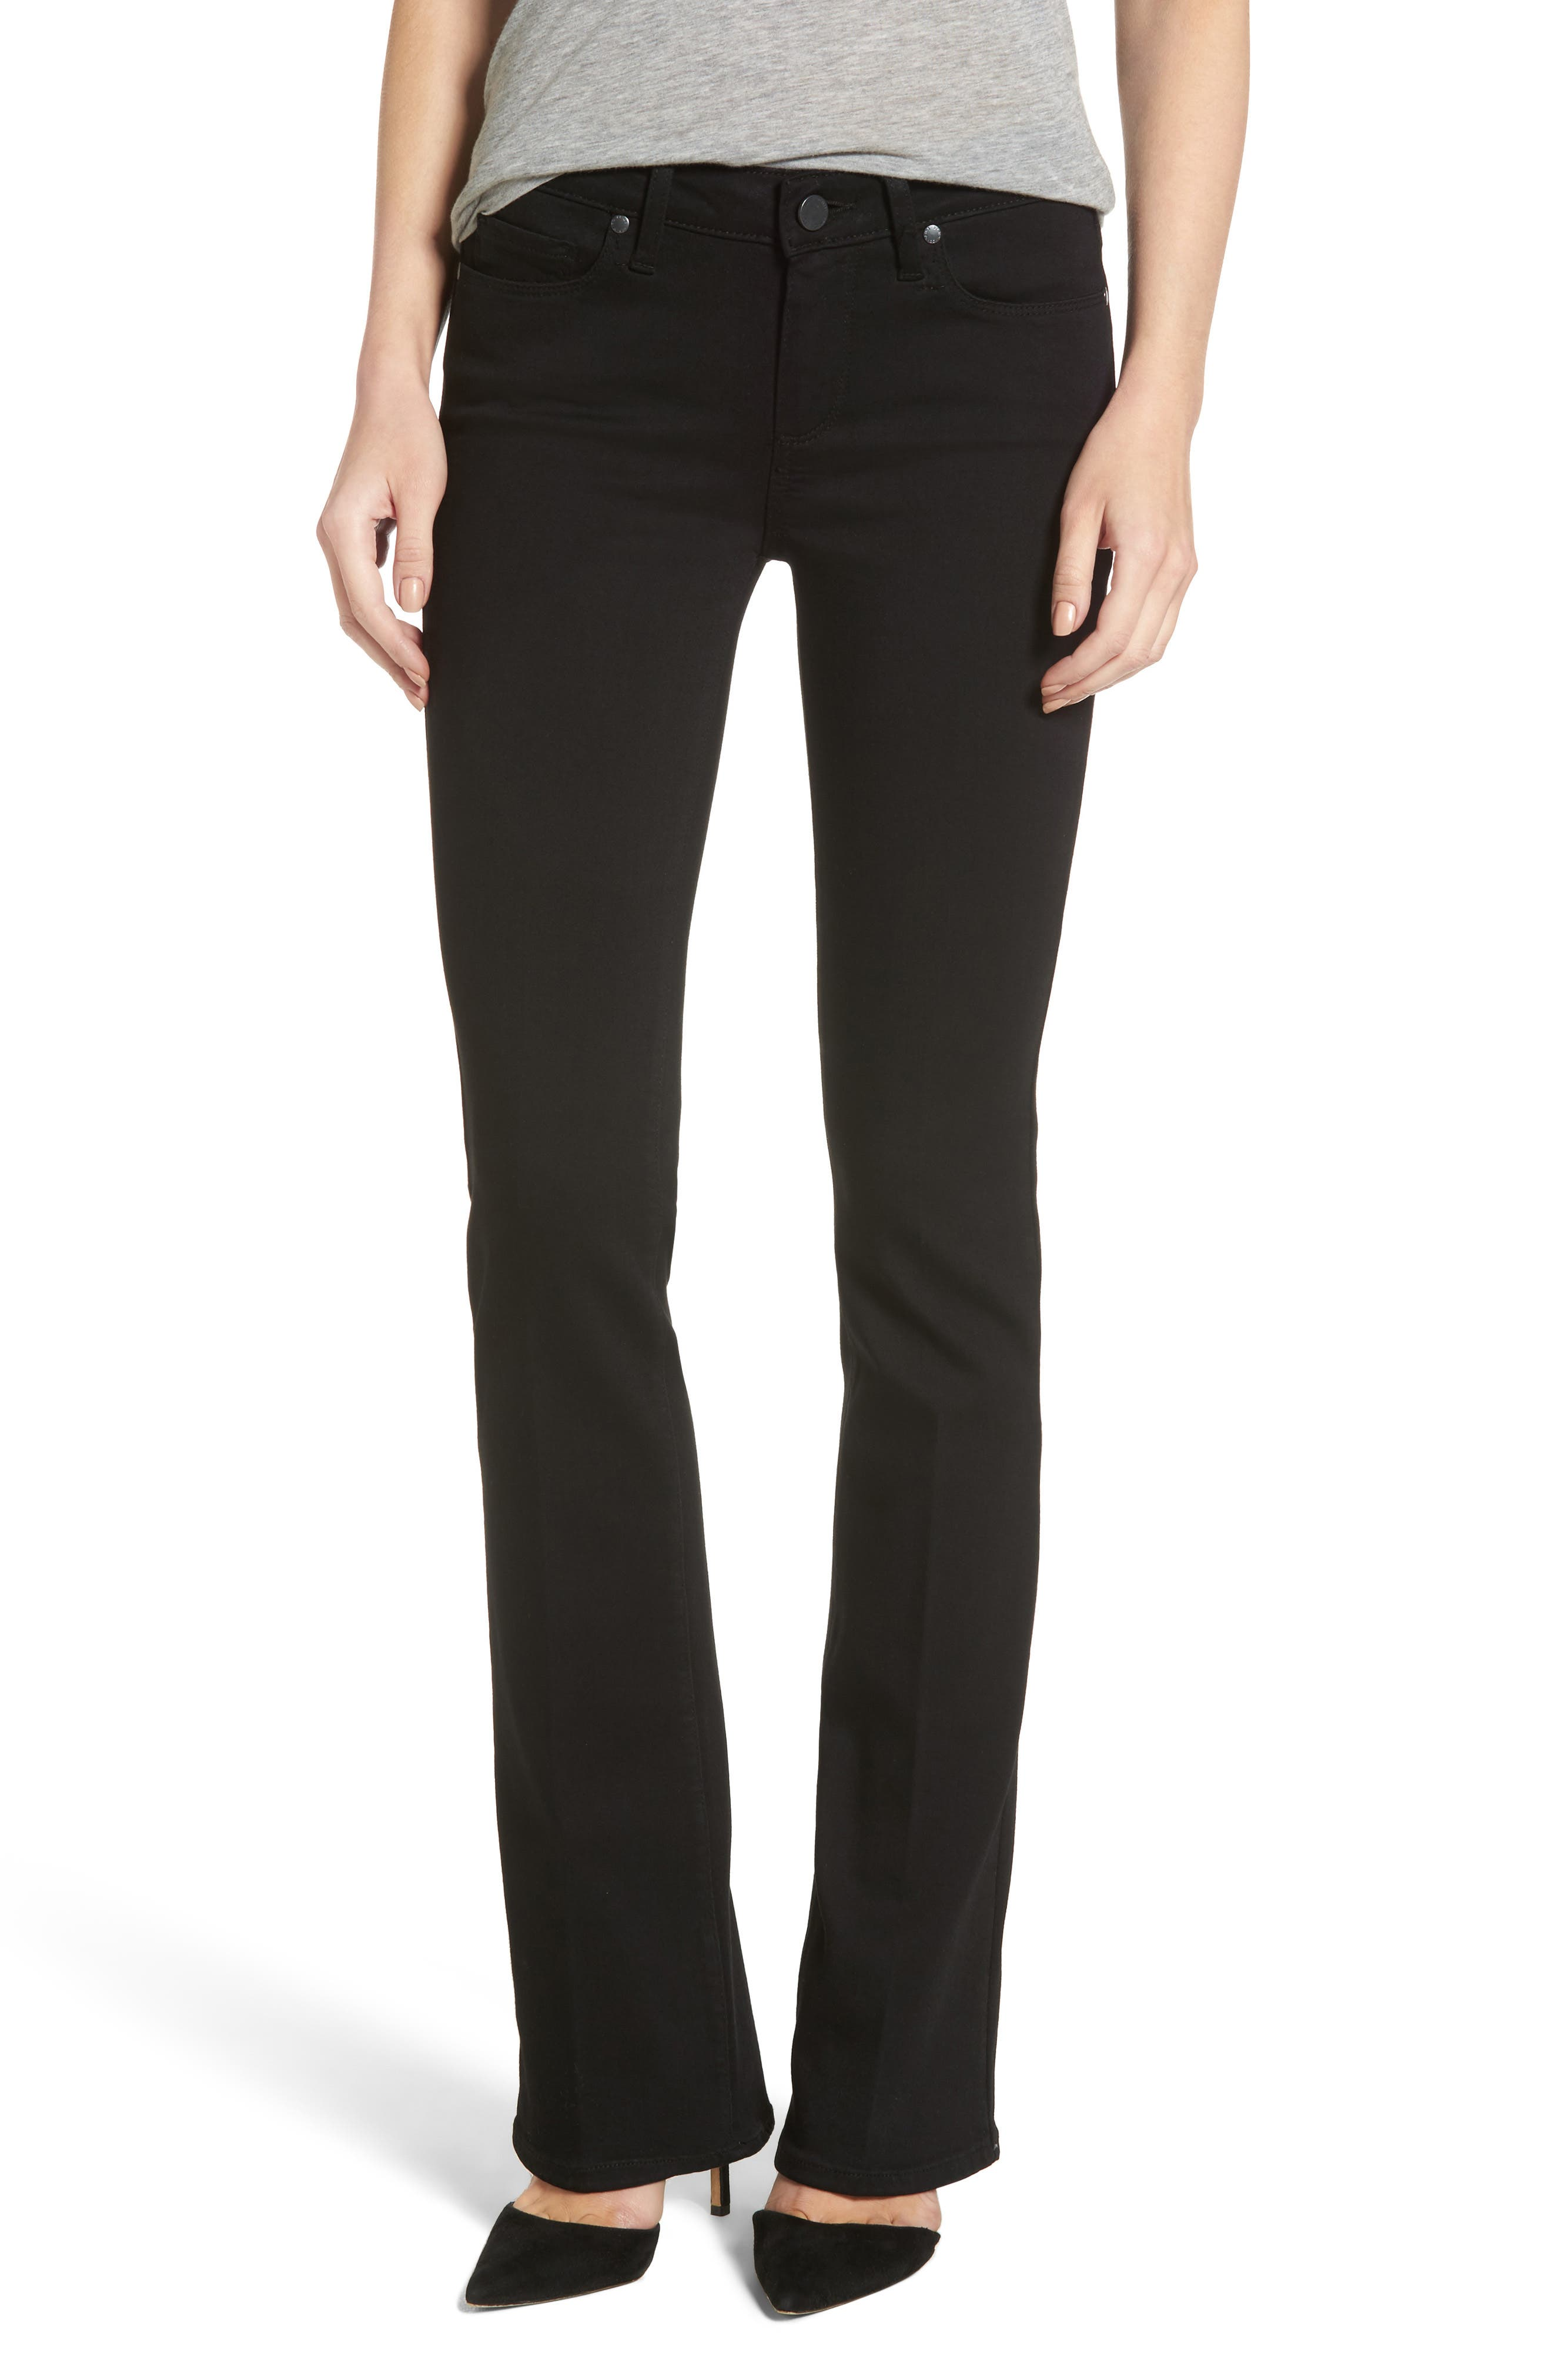 Main Image - PAIGE Transcend - Manhattan Bootcut Jeans (Black Shadow)